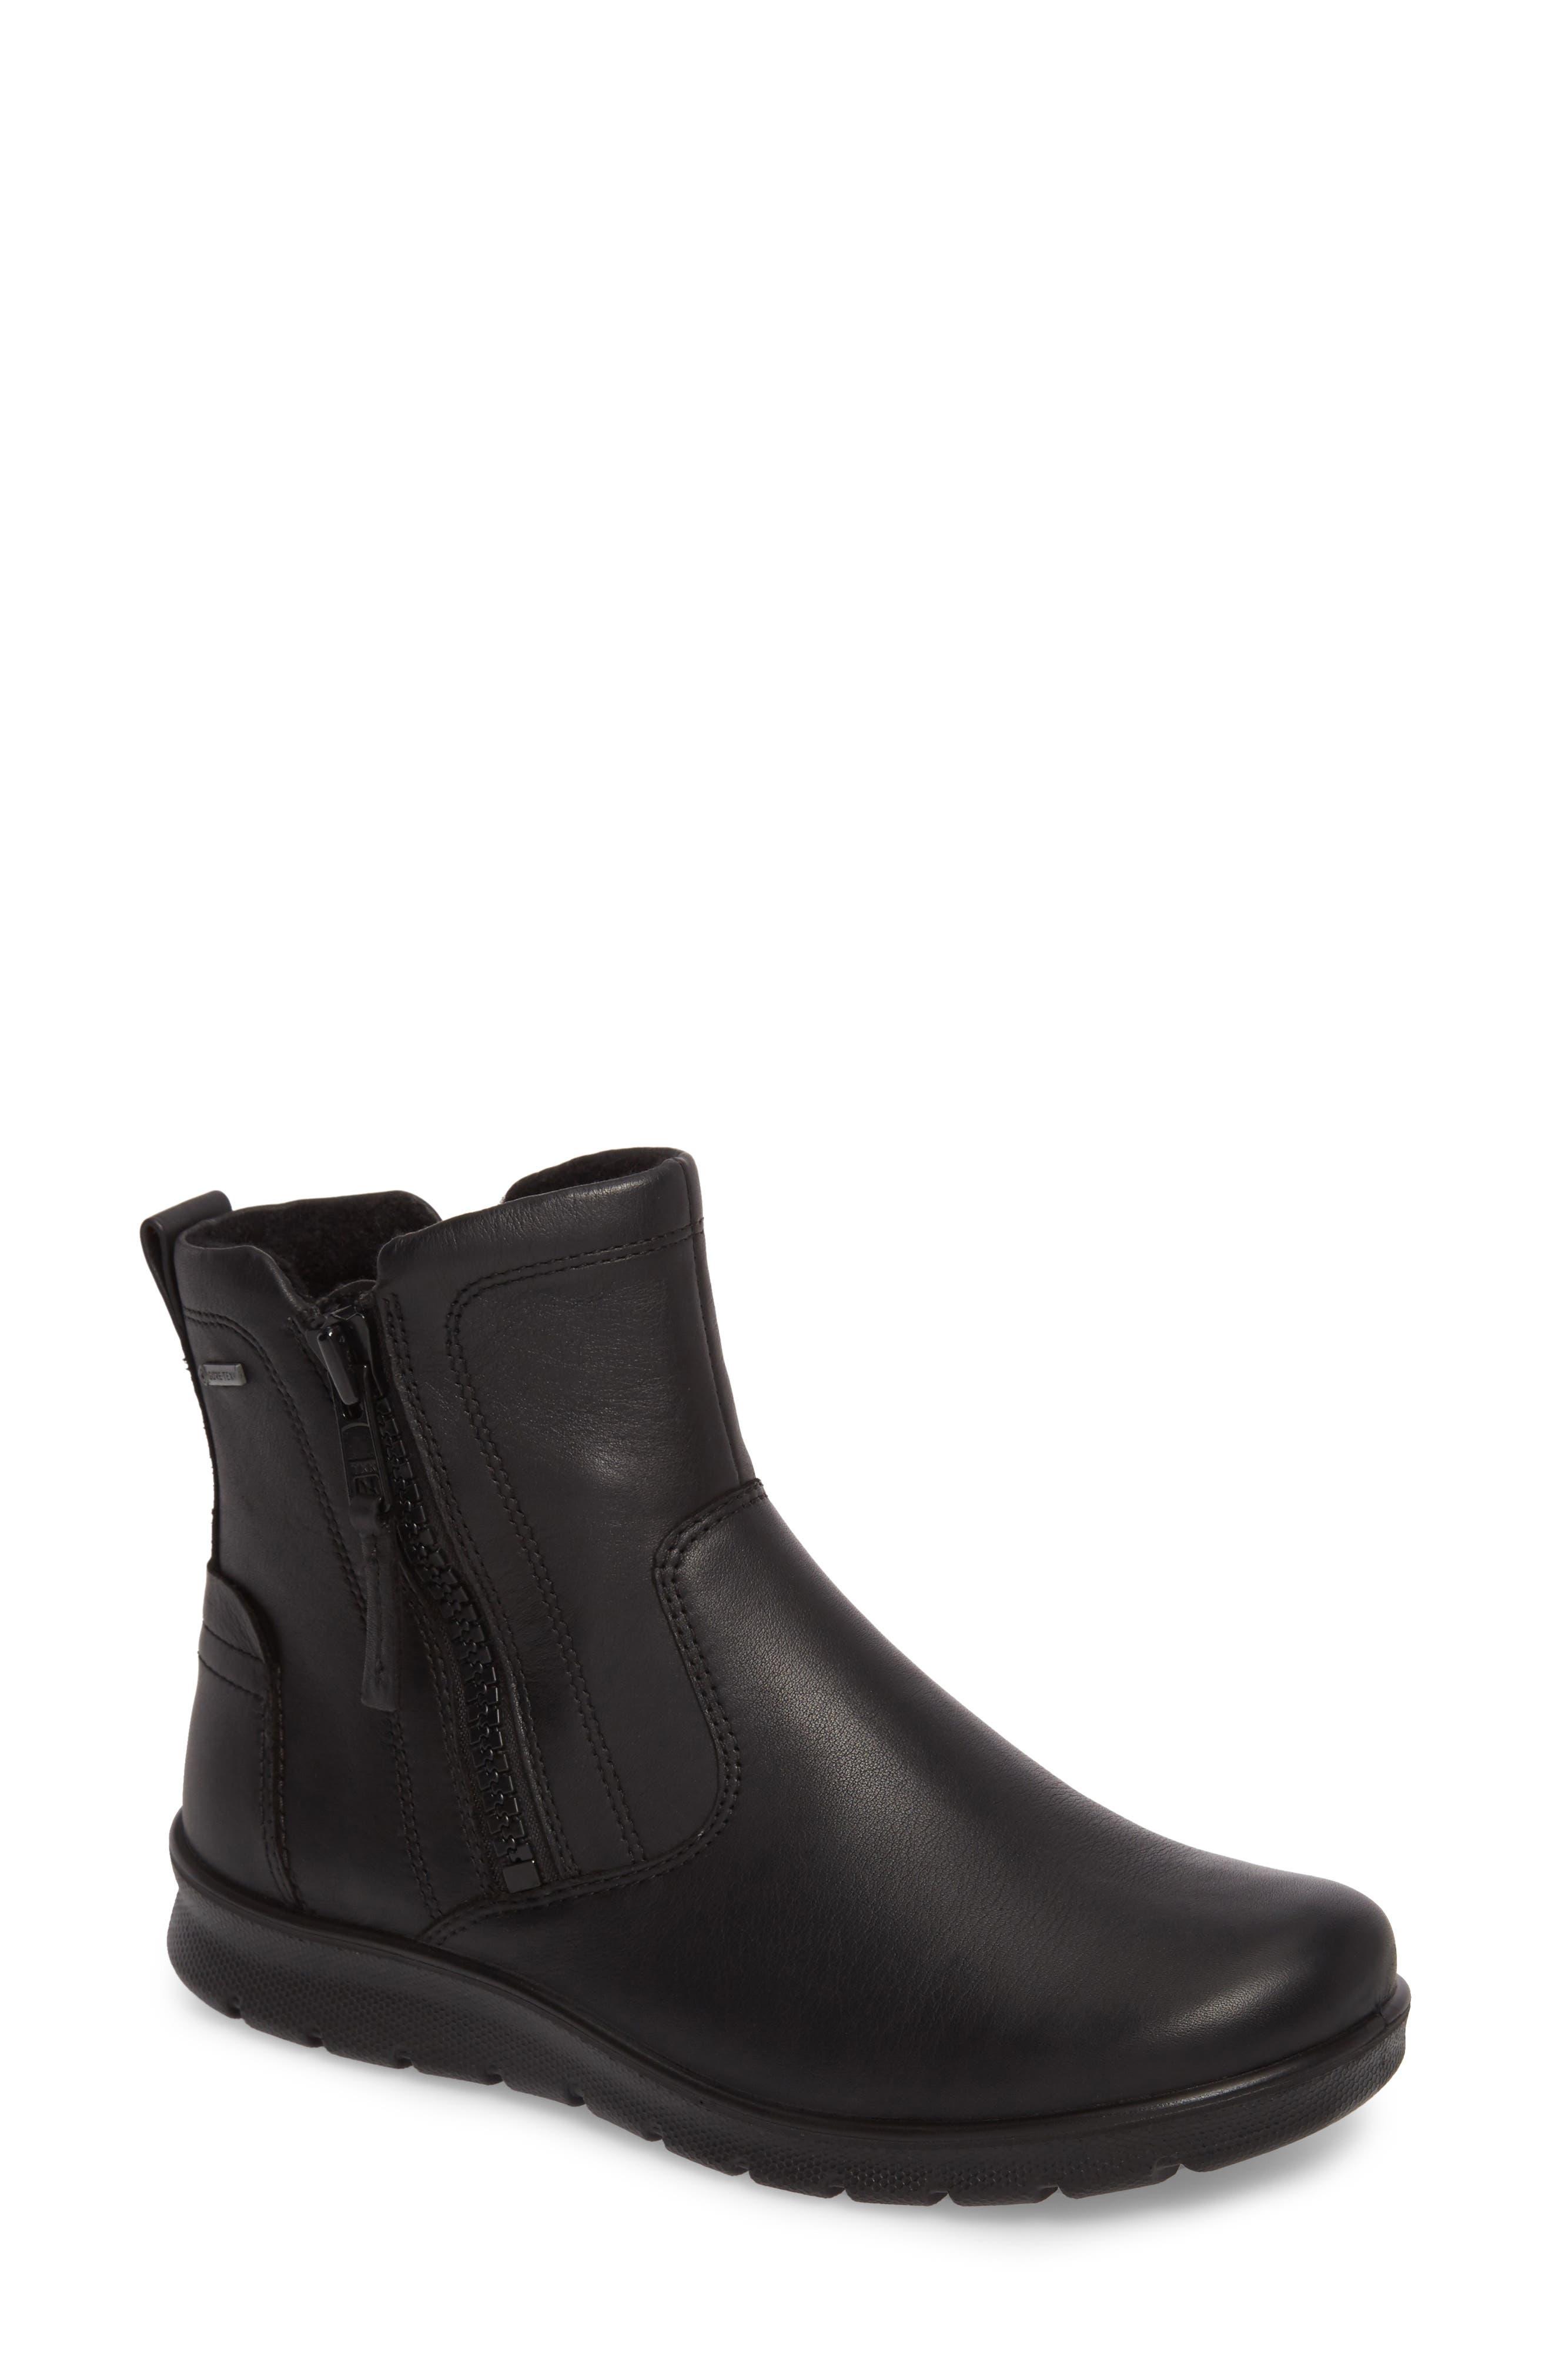 Babett Gore-Tex<sup>®</sup> Bootie,                             Main thumbnail 1, color,                             Black Leather